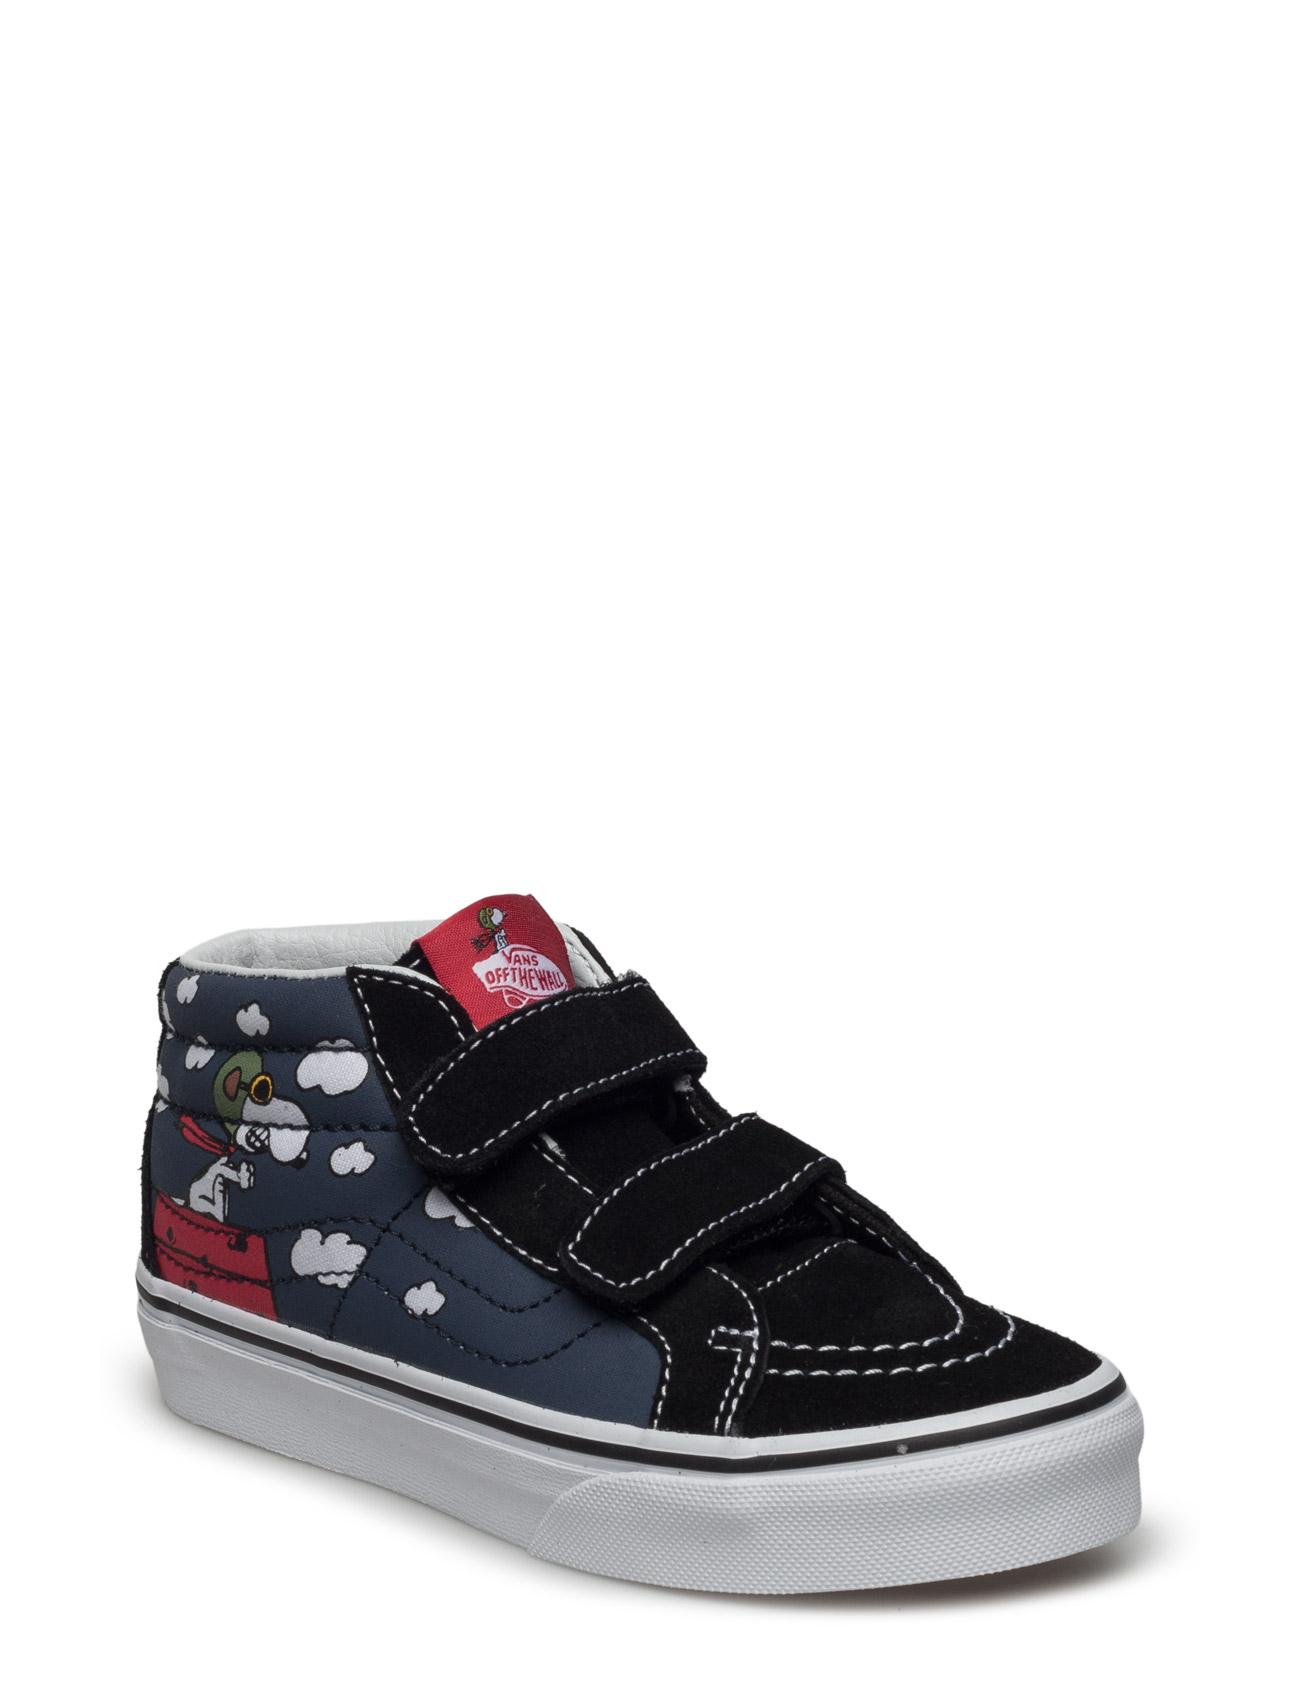 Uy Sk8-Mid Reissue V (Peanuts)Fly VANS Sko & Sneakers til Børn i